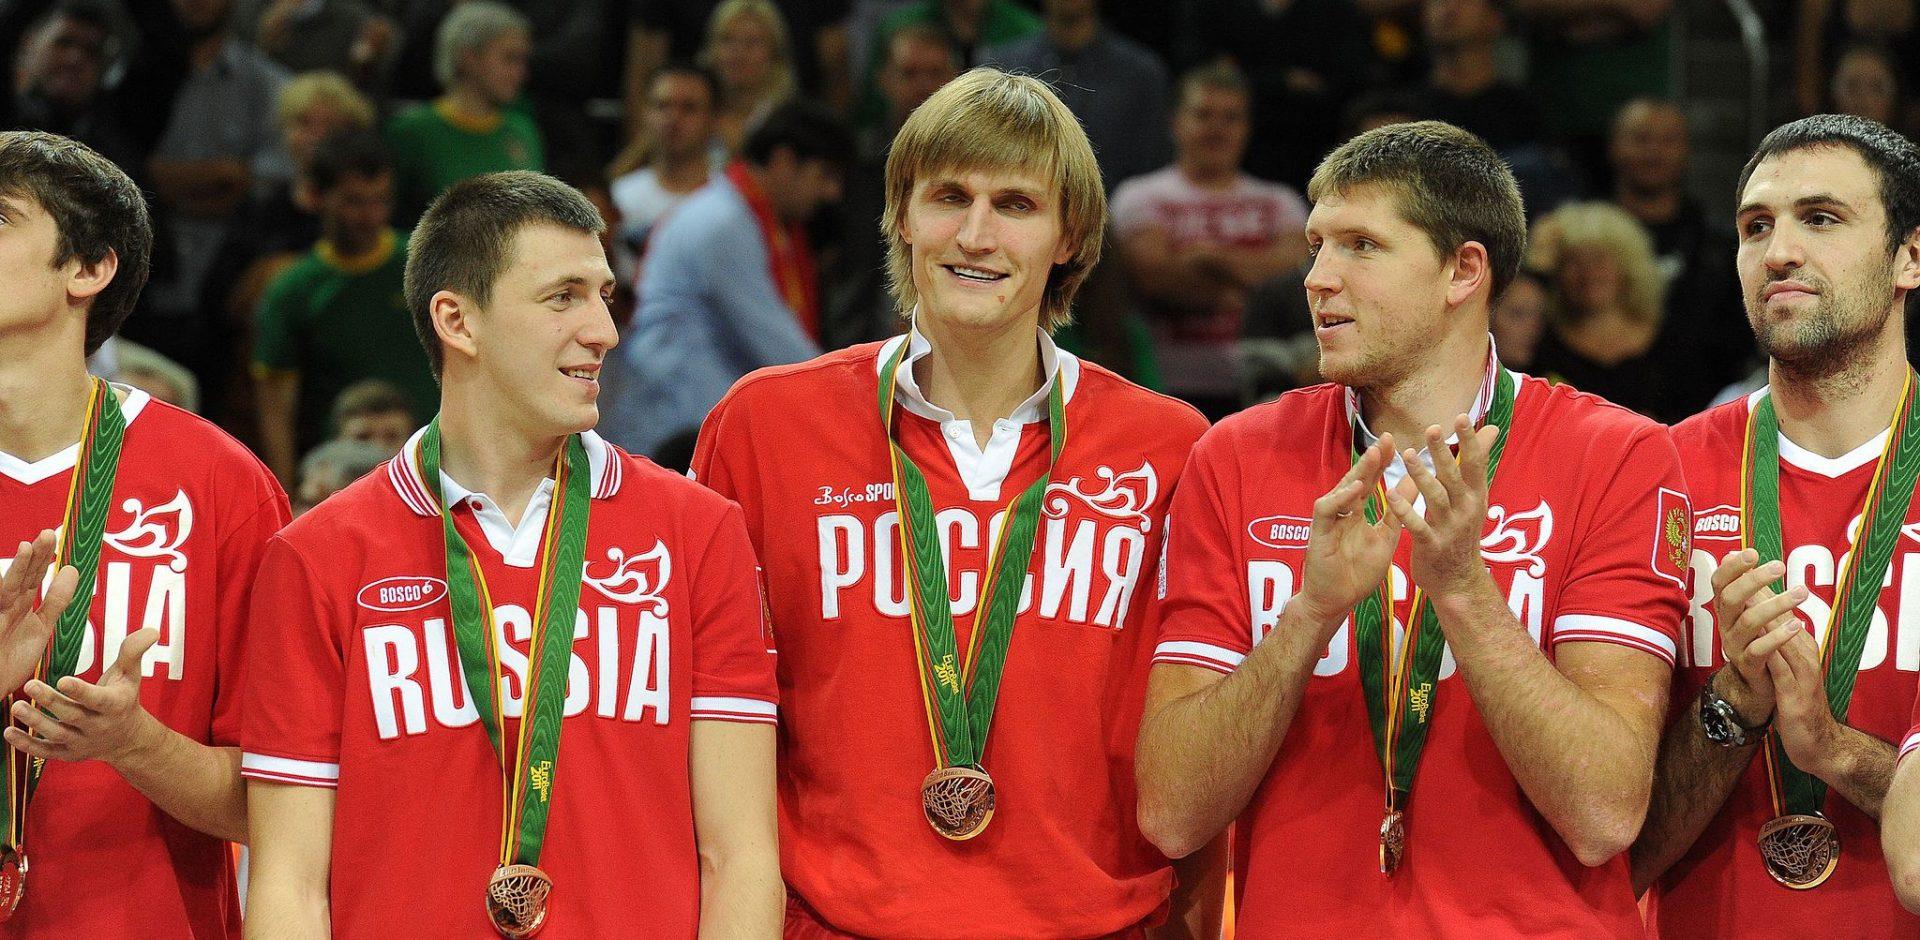 Ruský národní basketbalový tým, Eurobasket 2011 / Christopher Johnson via Wikimedia Commons